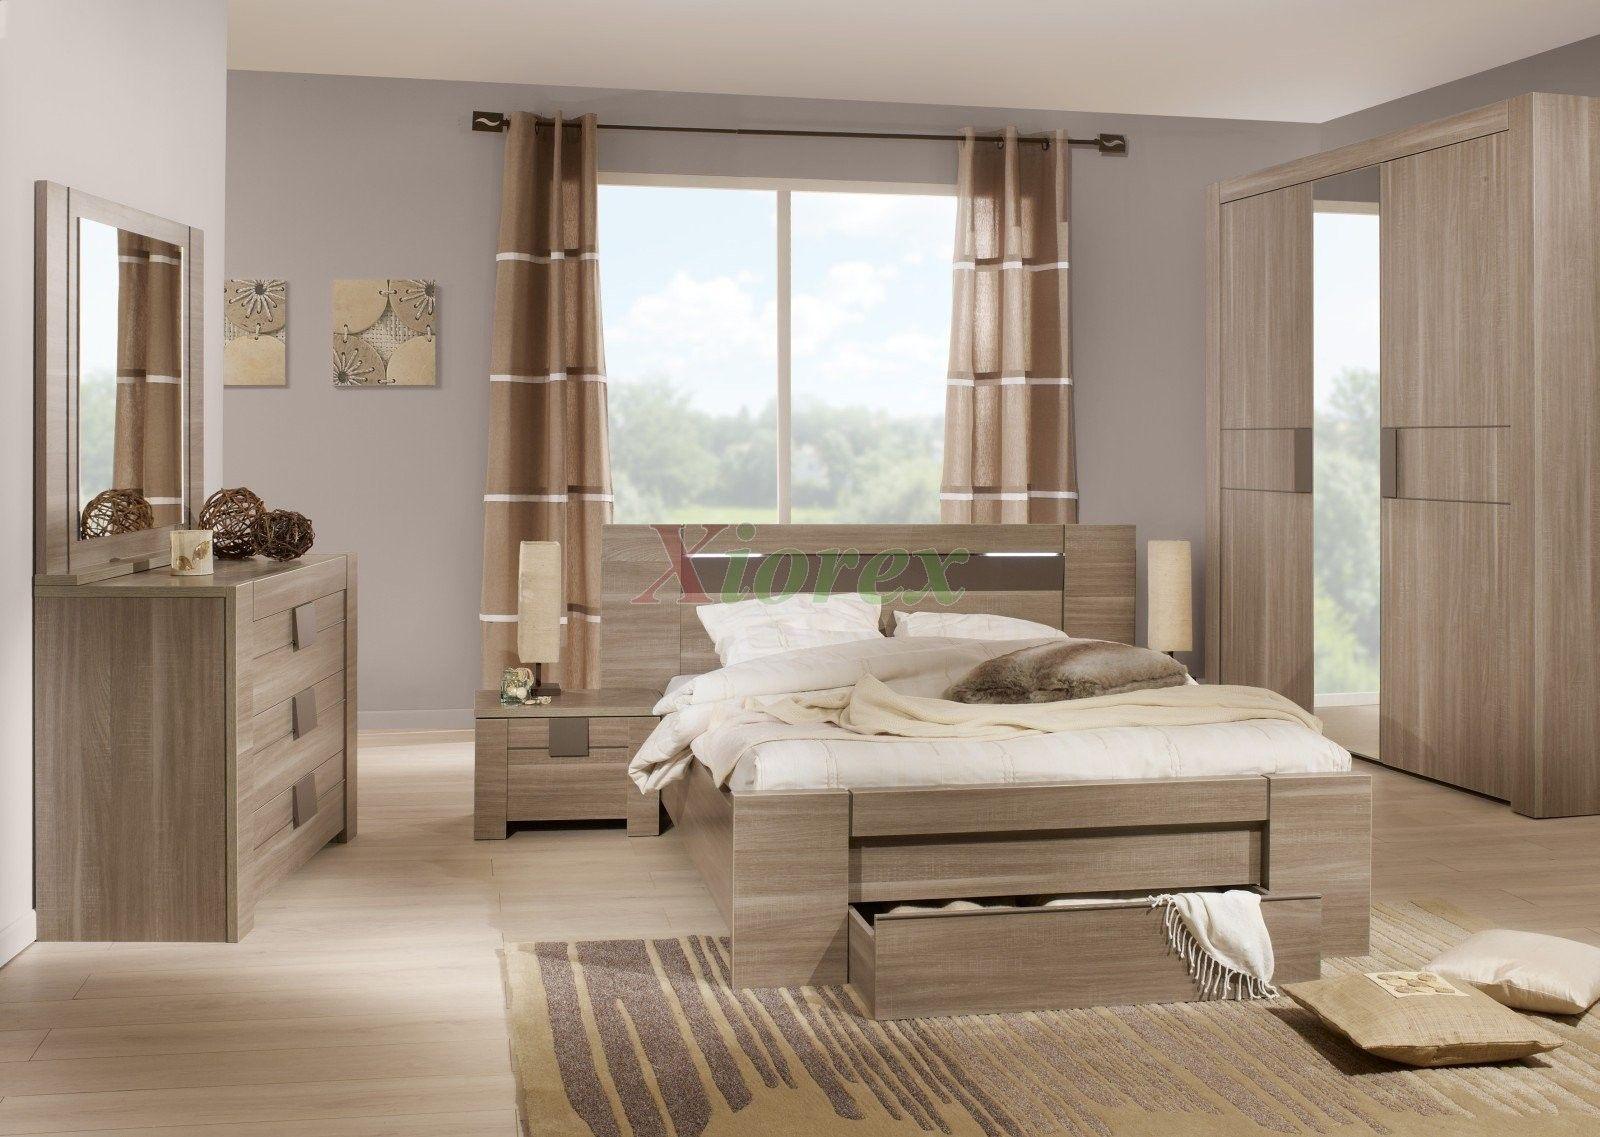 . Master Bedroom Sets   Gami Moka bed sets by Gautier are contemporary